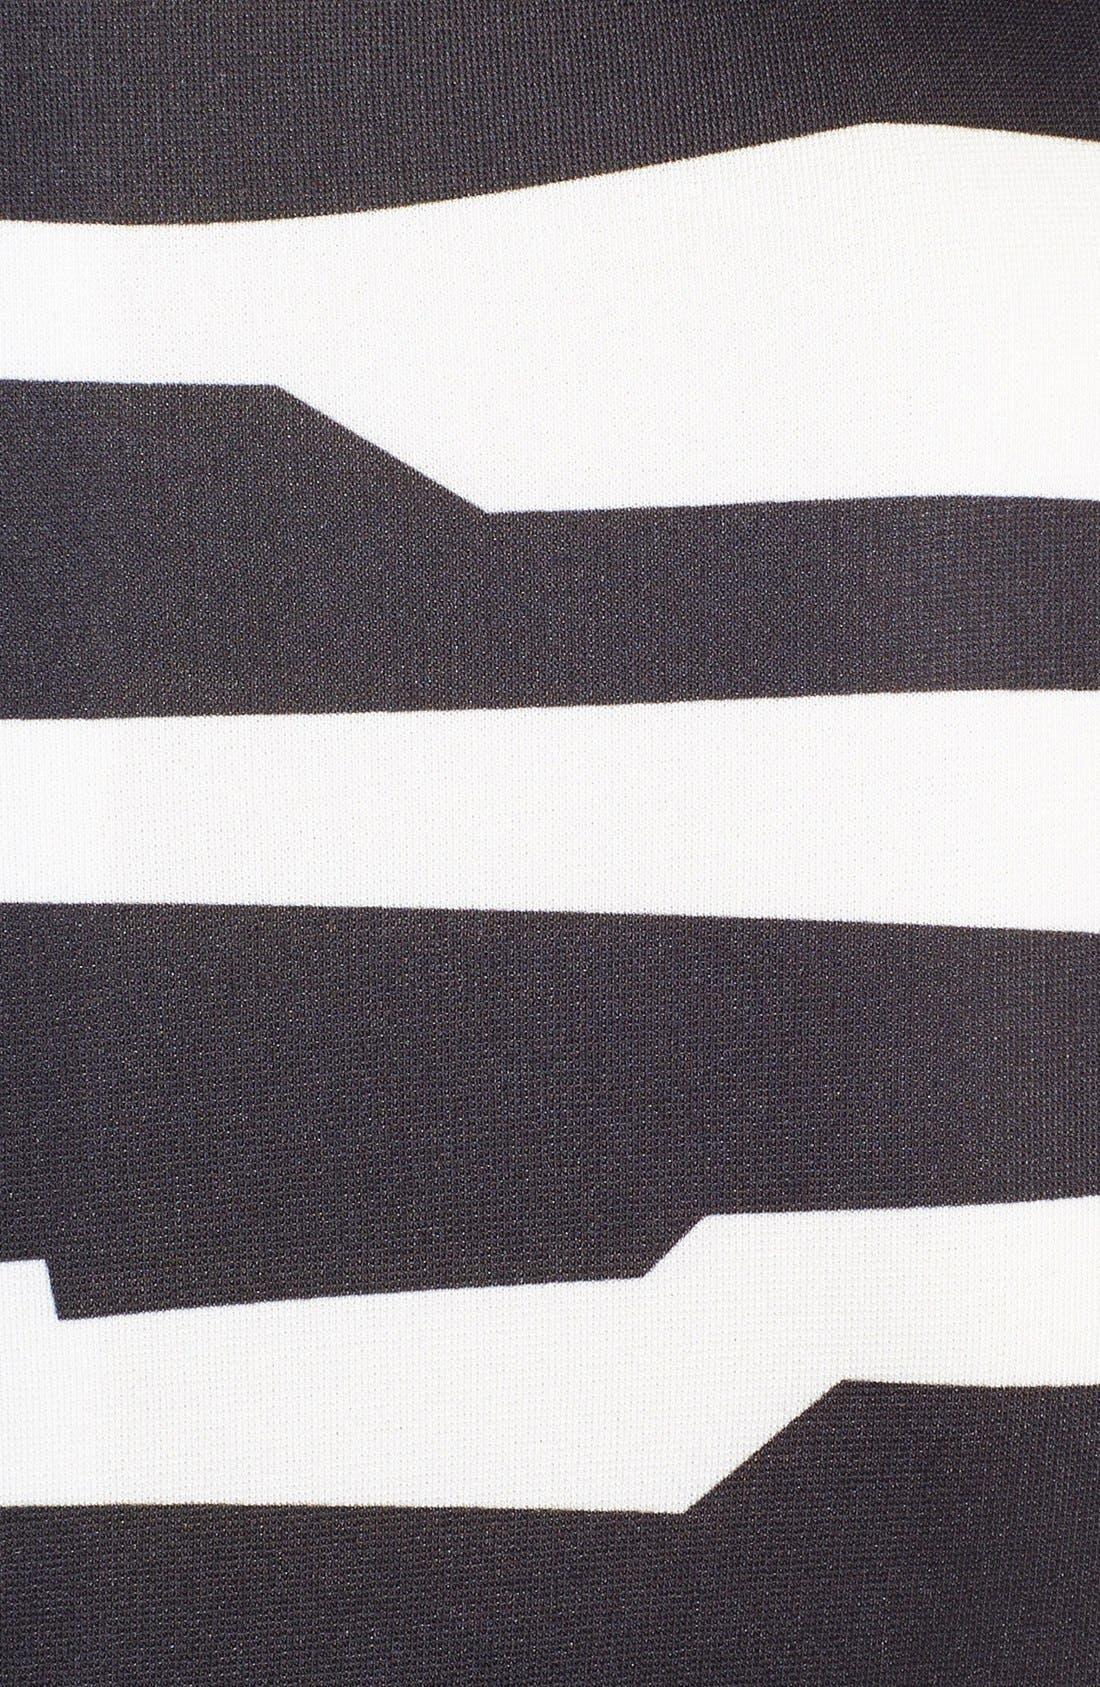 Alternate Image 3  - Tahari Belted Print Scuba Sheath Dress